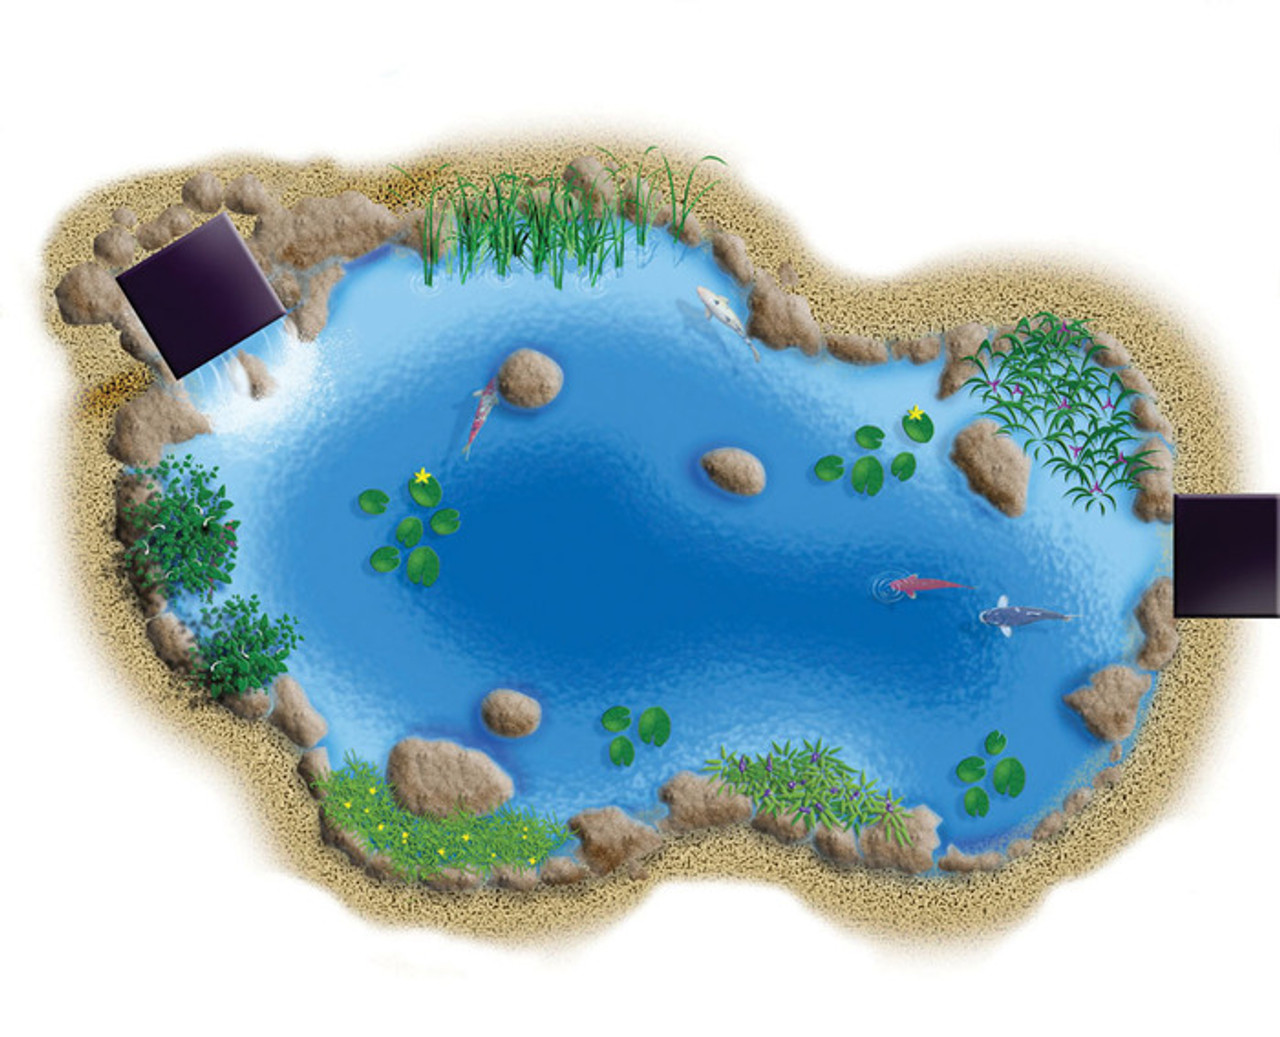 Aquascape Large Pond Kit - 21' x 26' (7000 GPH Pump)